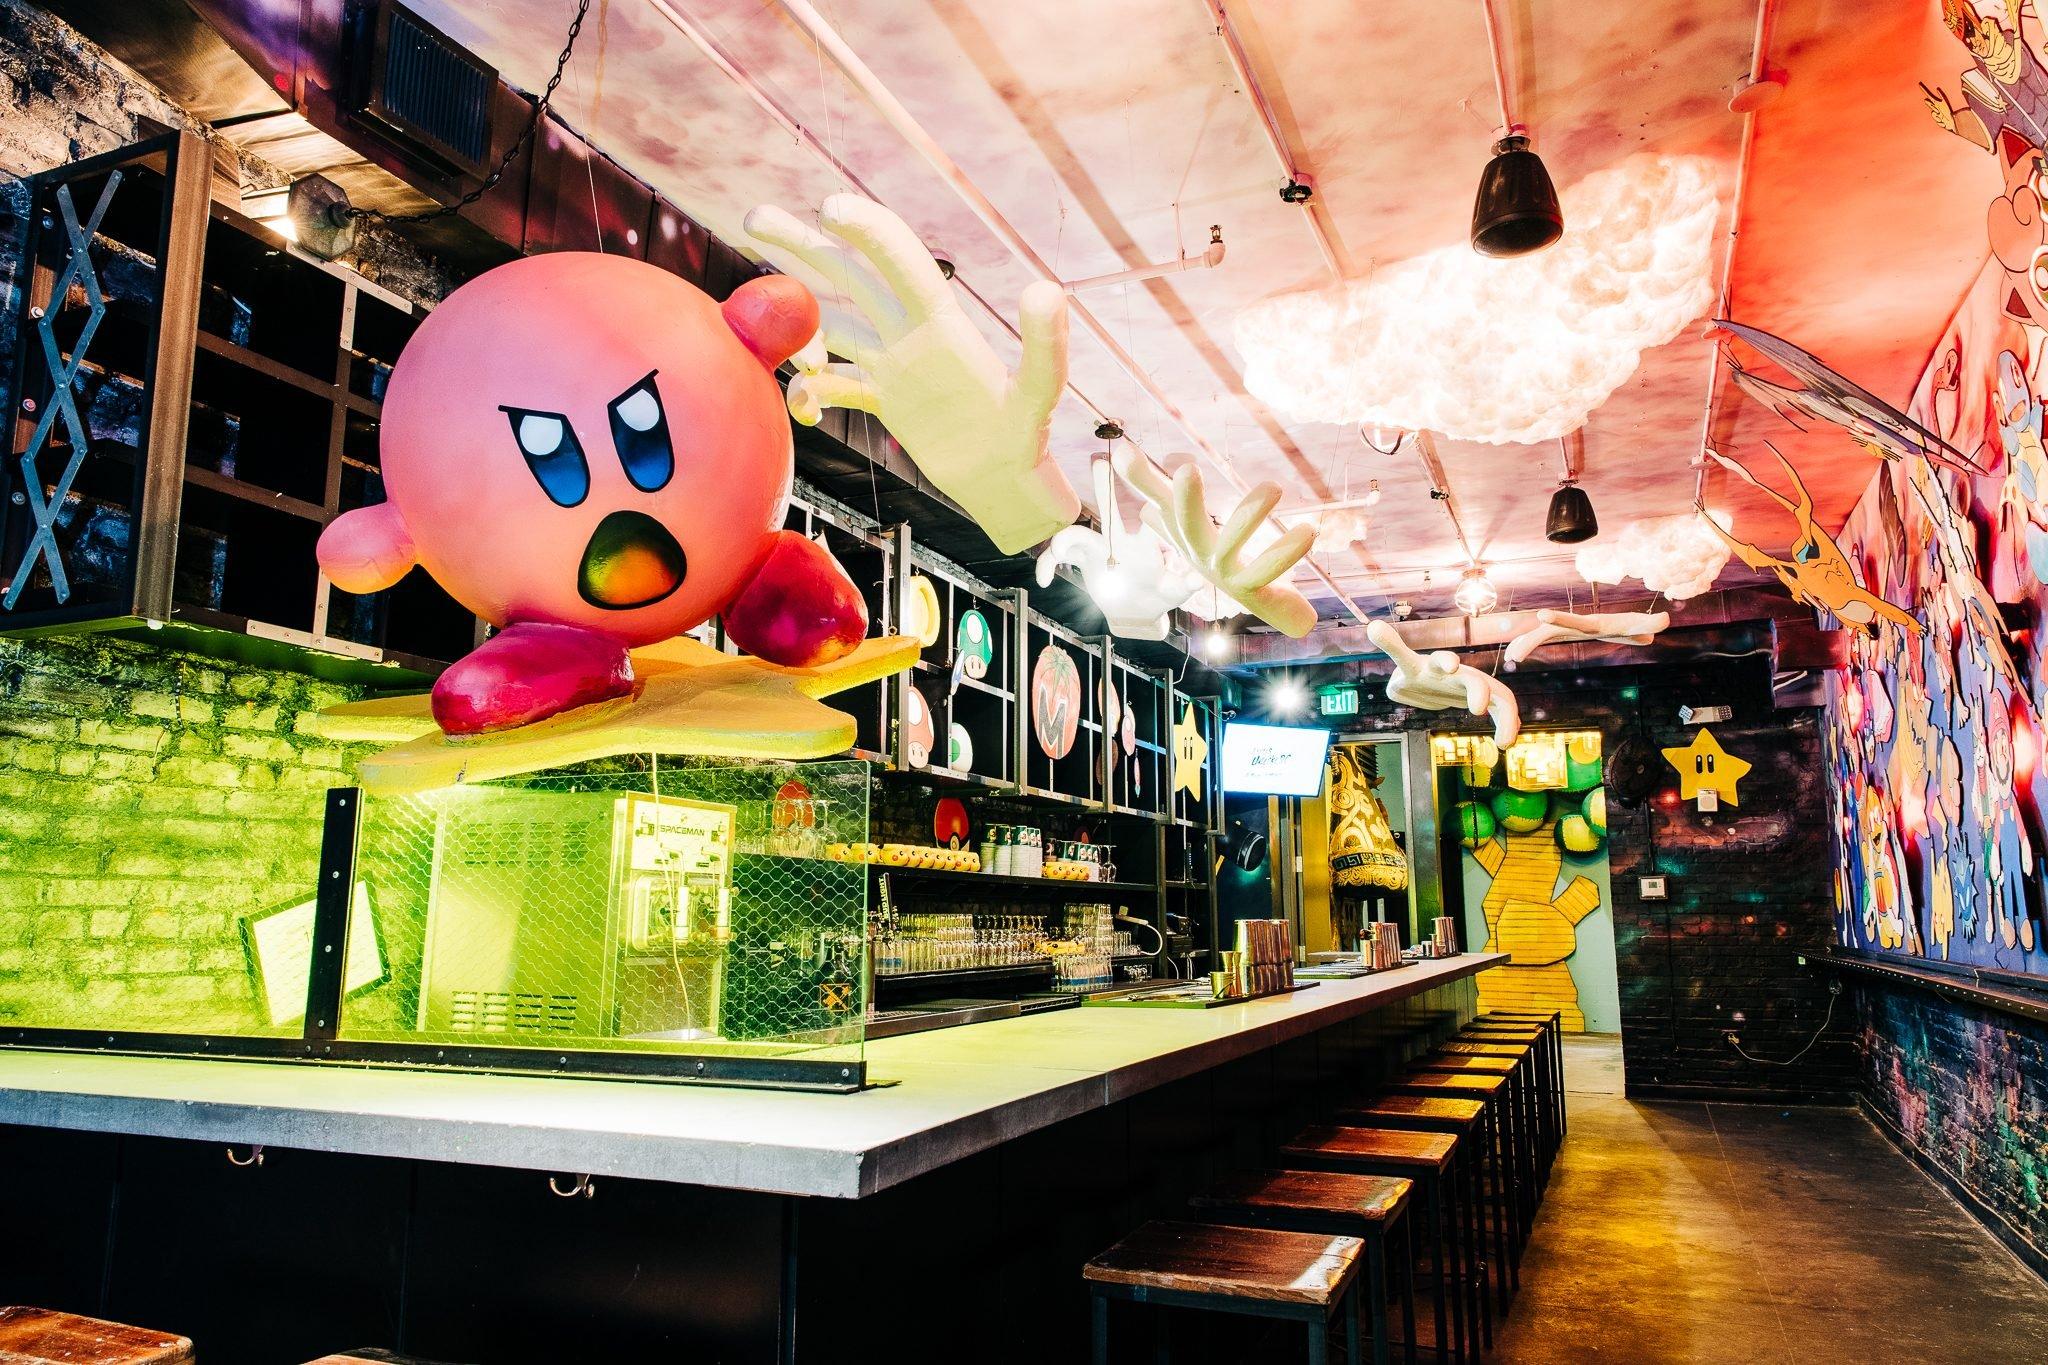 Take a Look Inside Drink Company's Trippy New Esports Pop-Up Bar